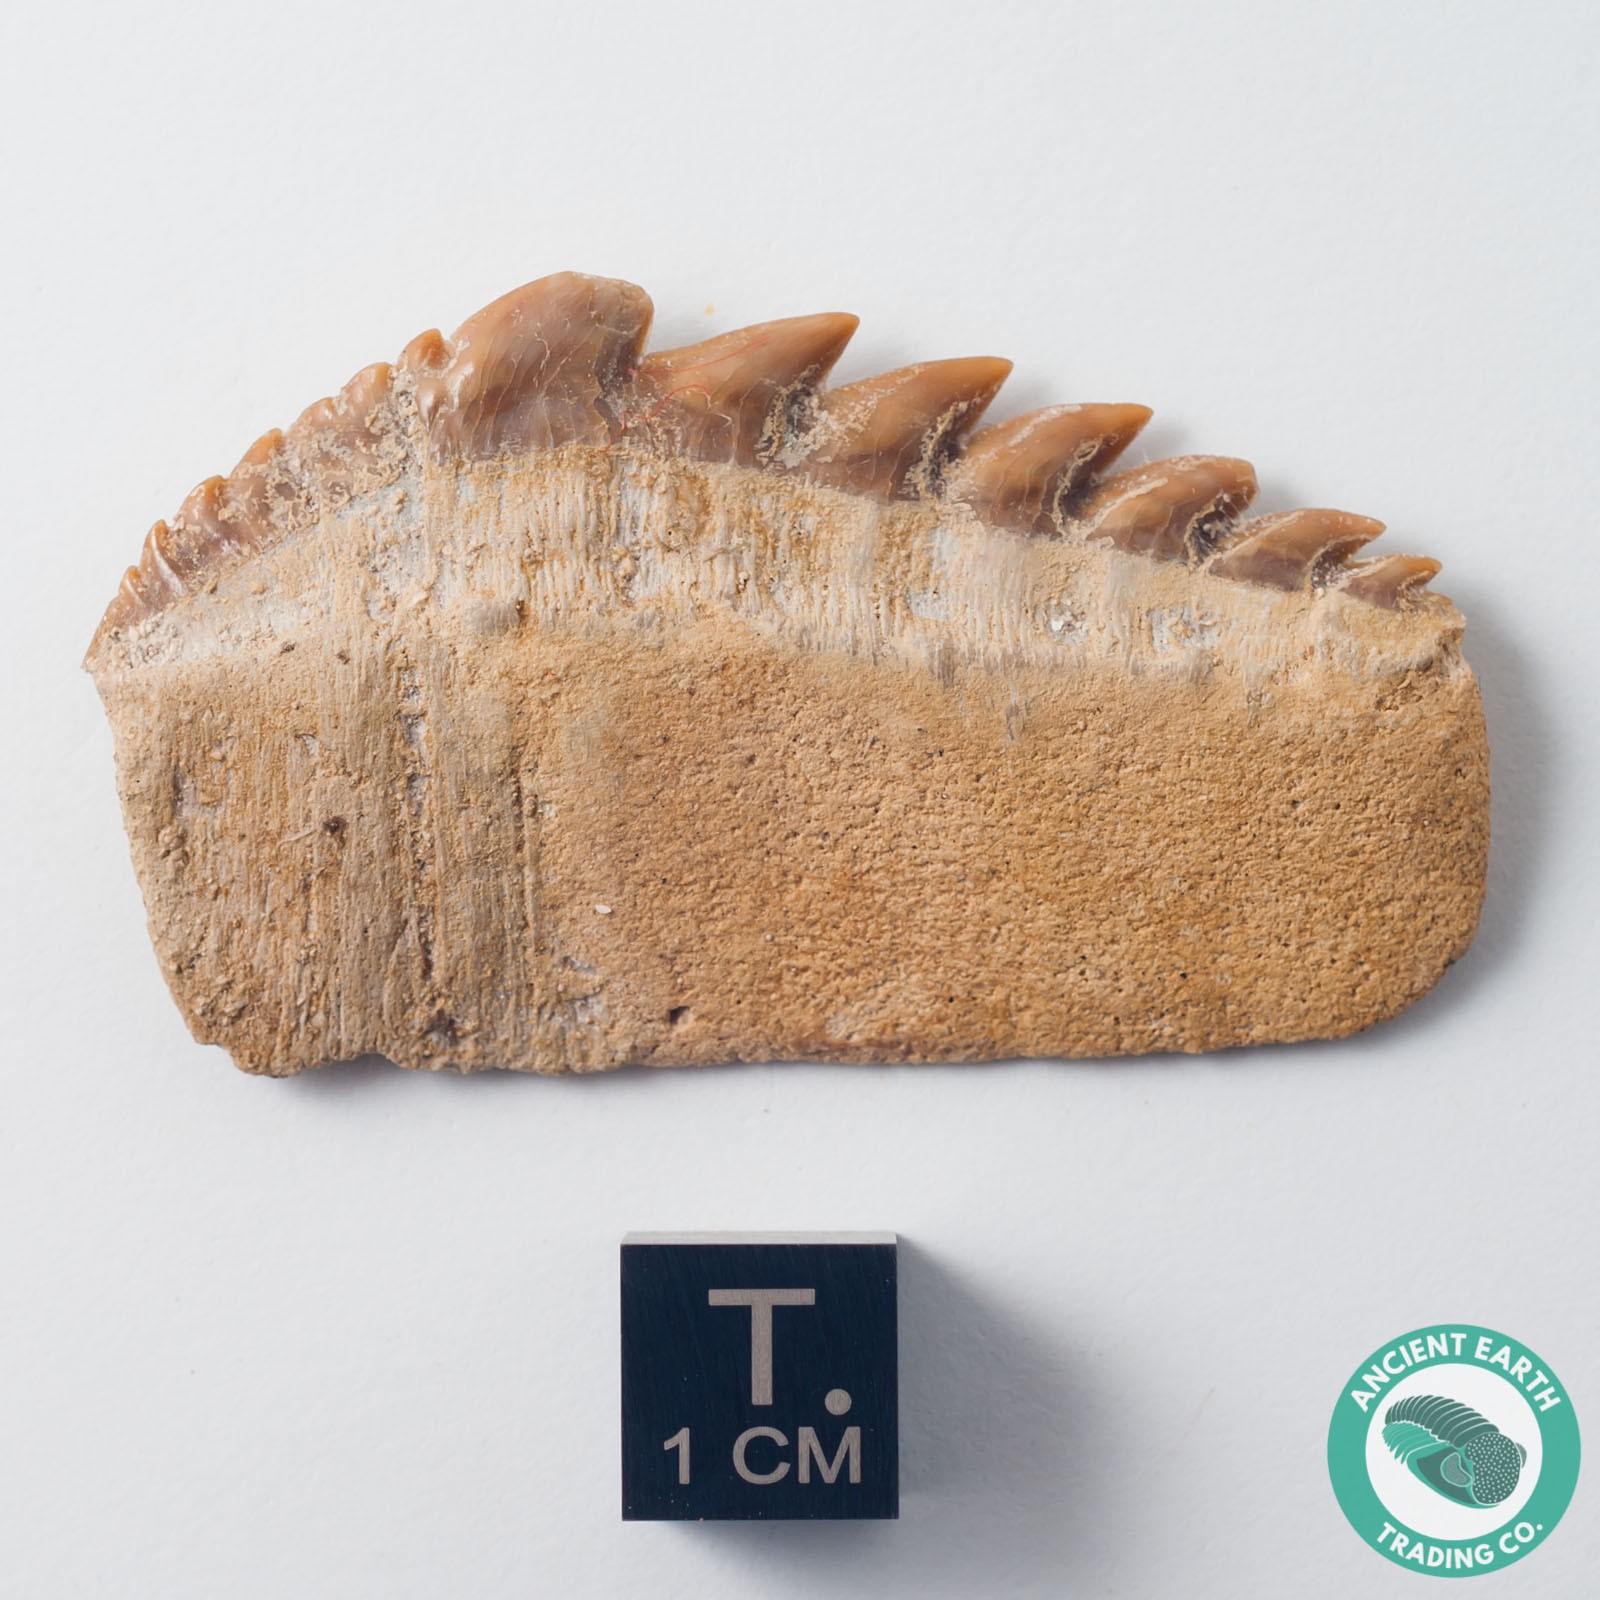 "2.07"" Notidanidon Cow Shark Tooth Fossil - Morocco"